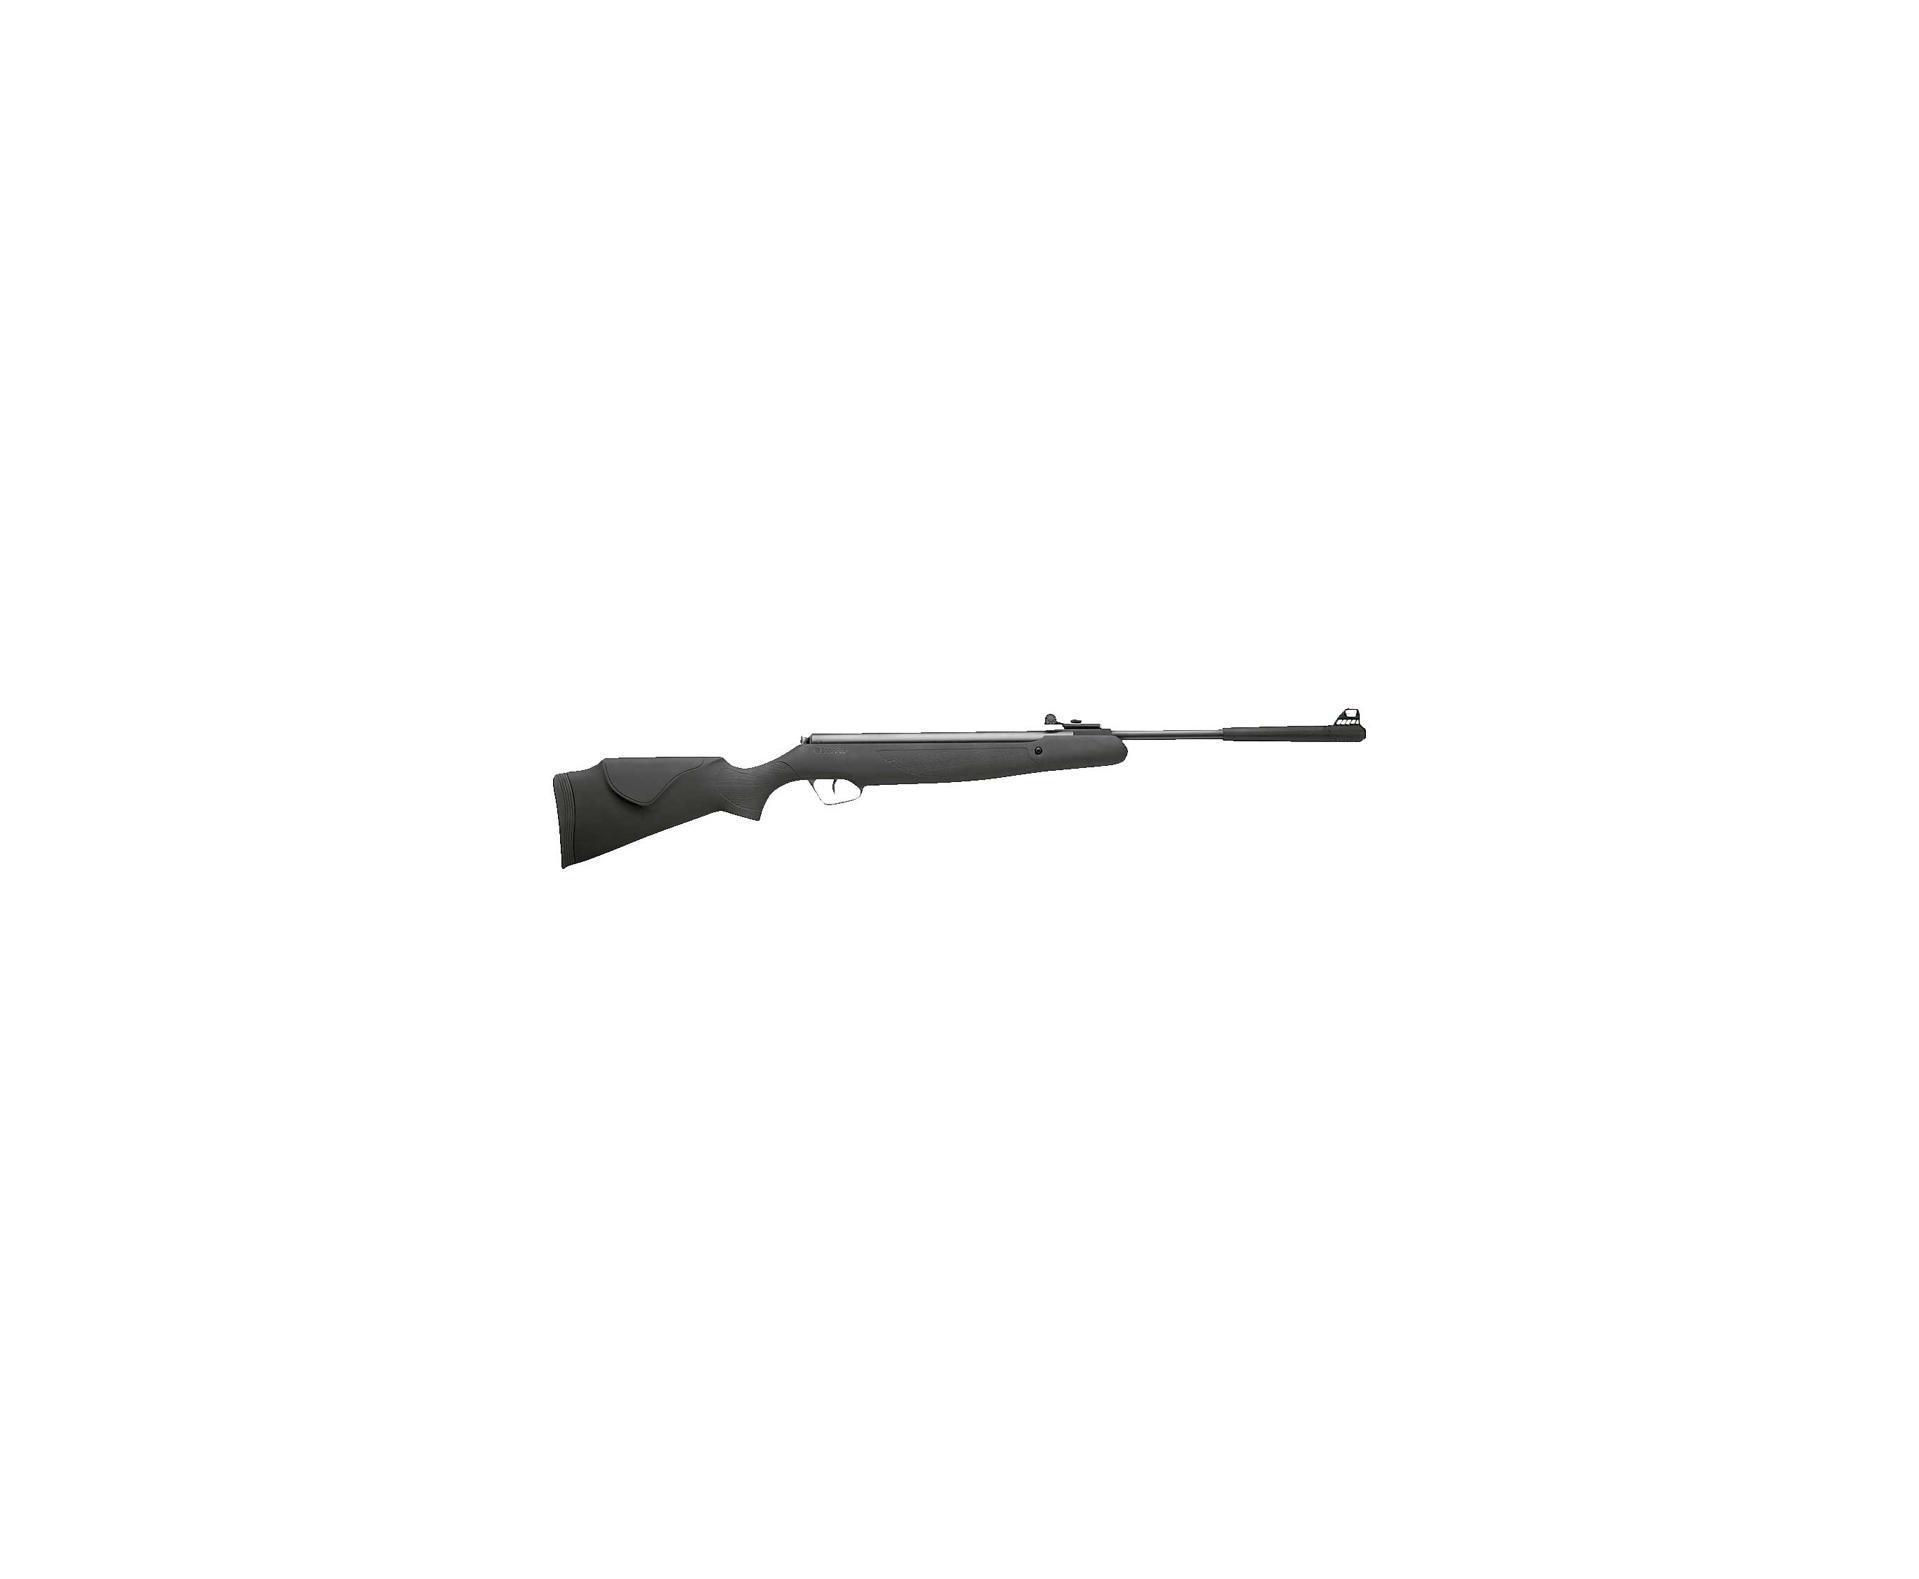 Carabina De Pressão X20 - Preta - Calibre 5,5 Mm - Stoeger Airguns/bereta